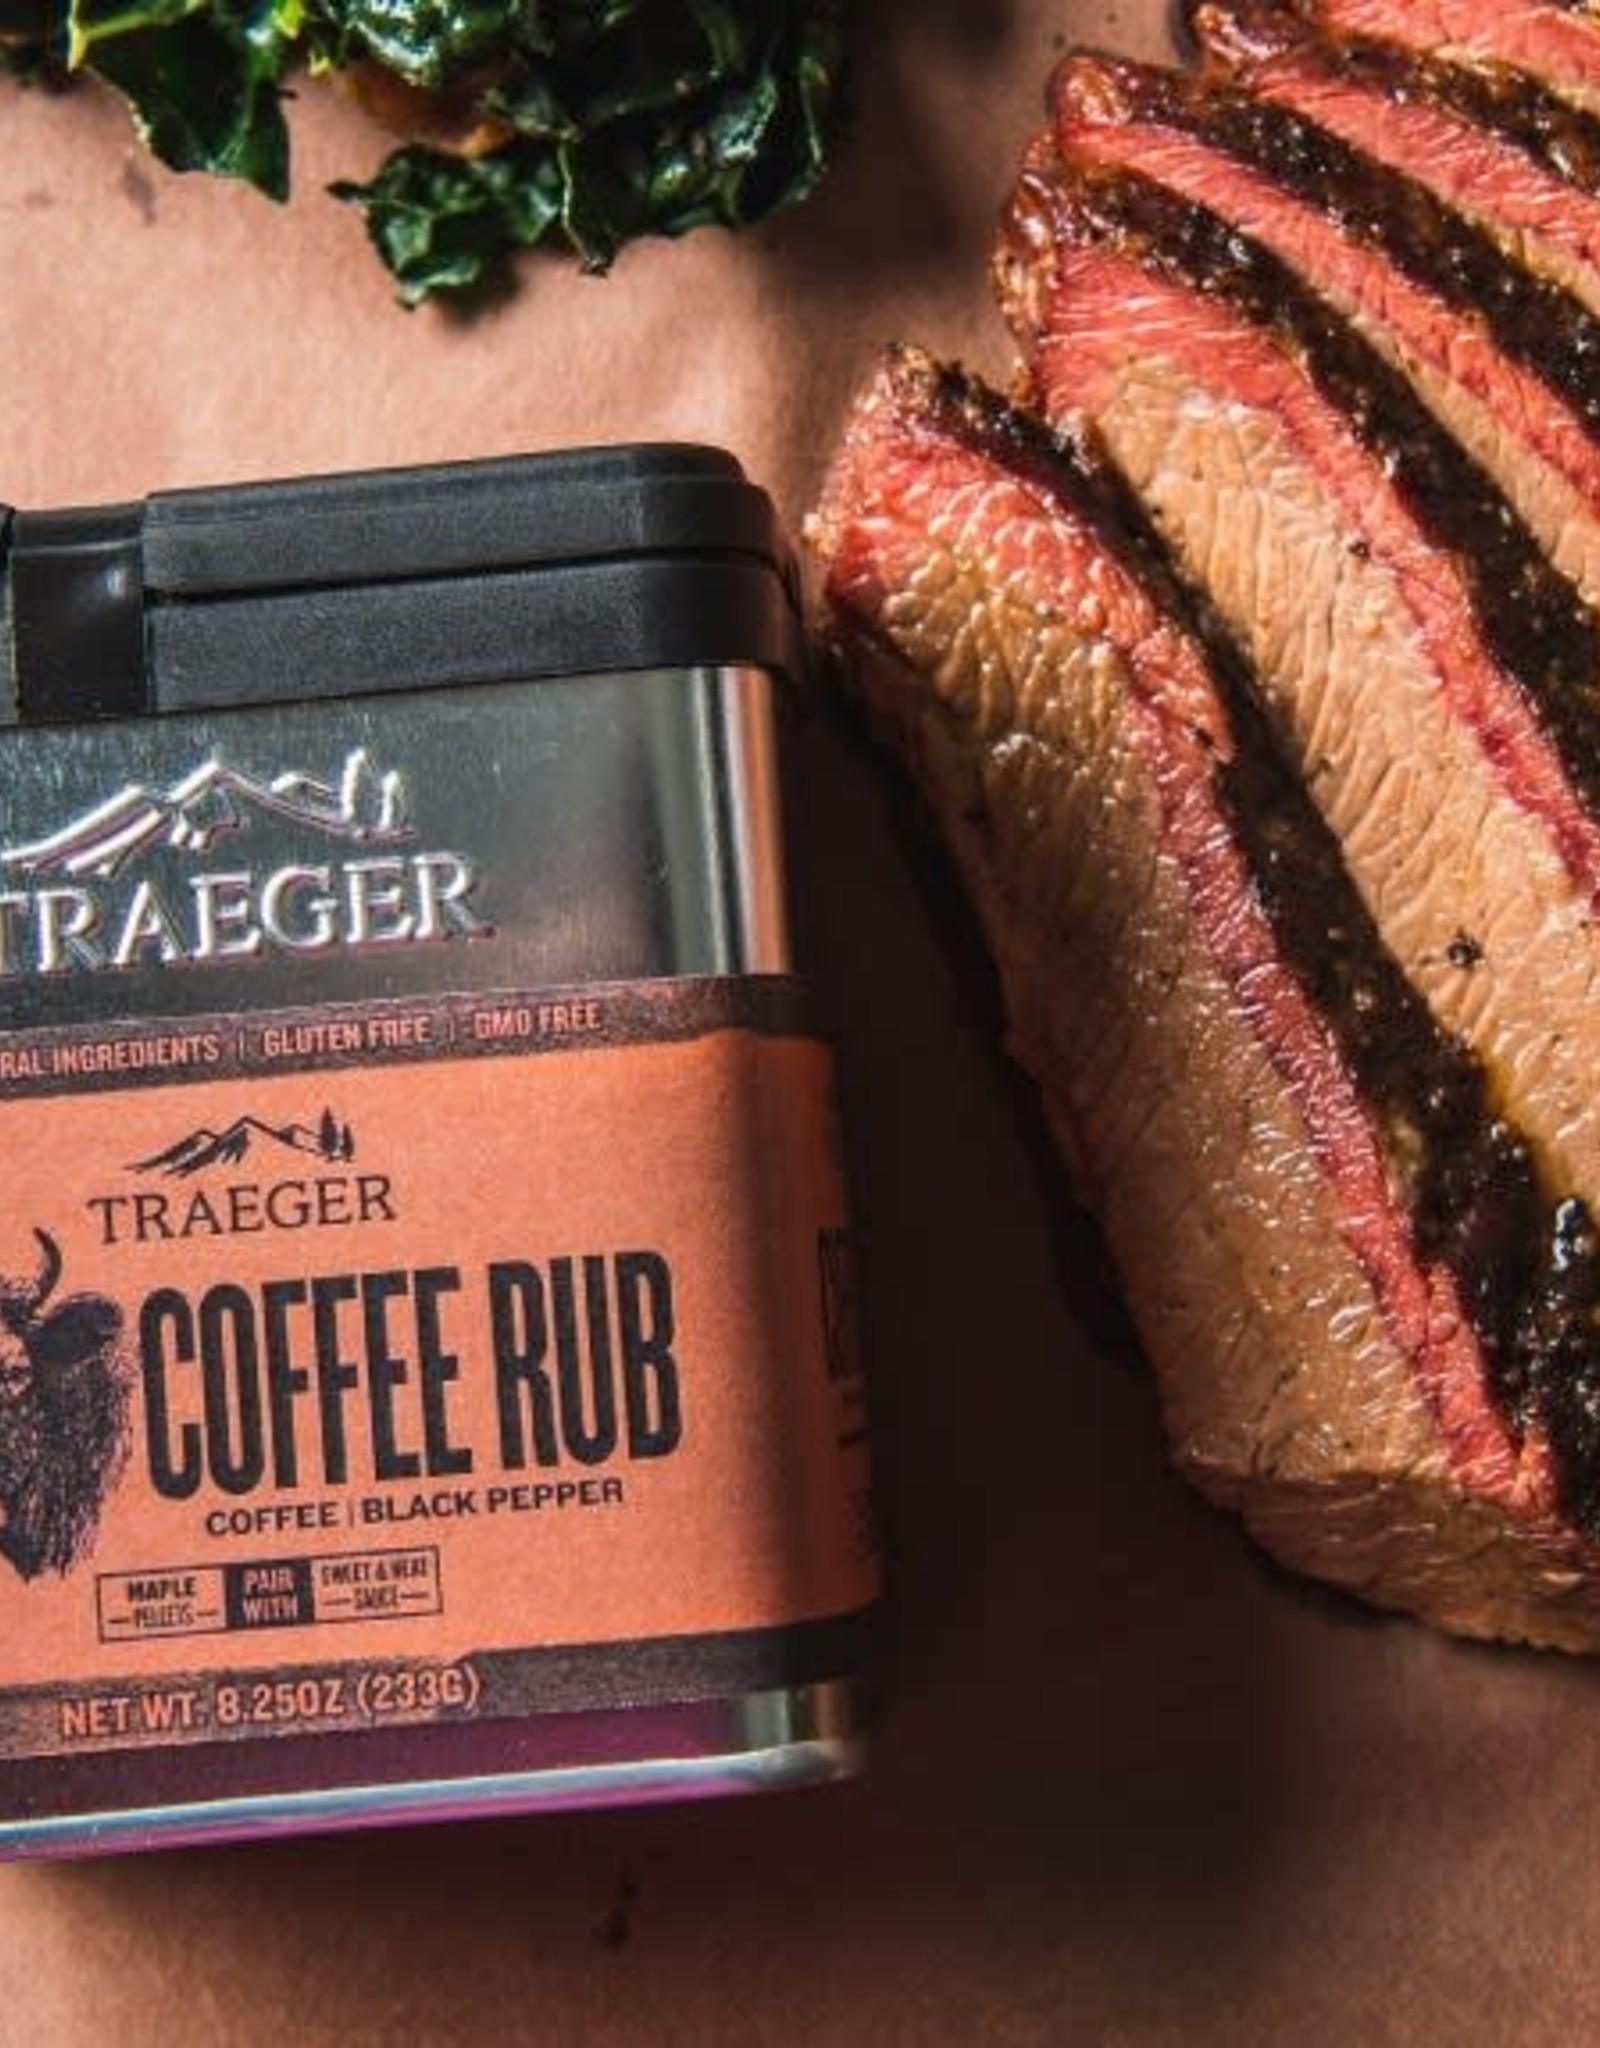 Traeger Traeger Coffee Rub - SPC172